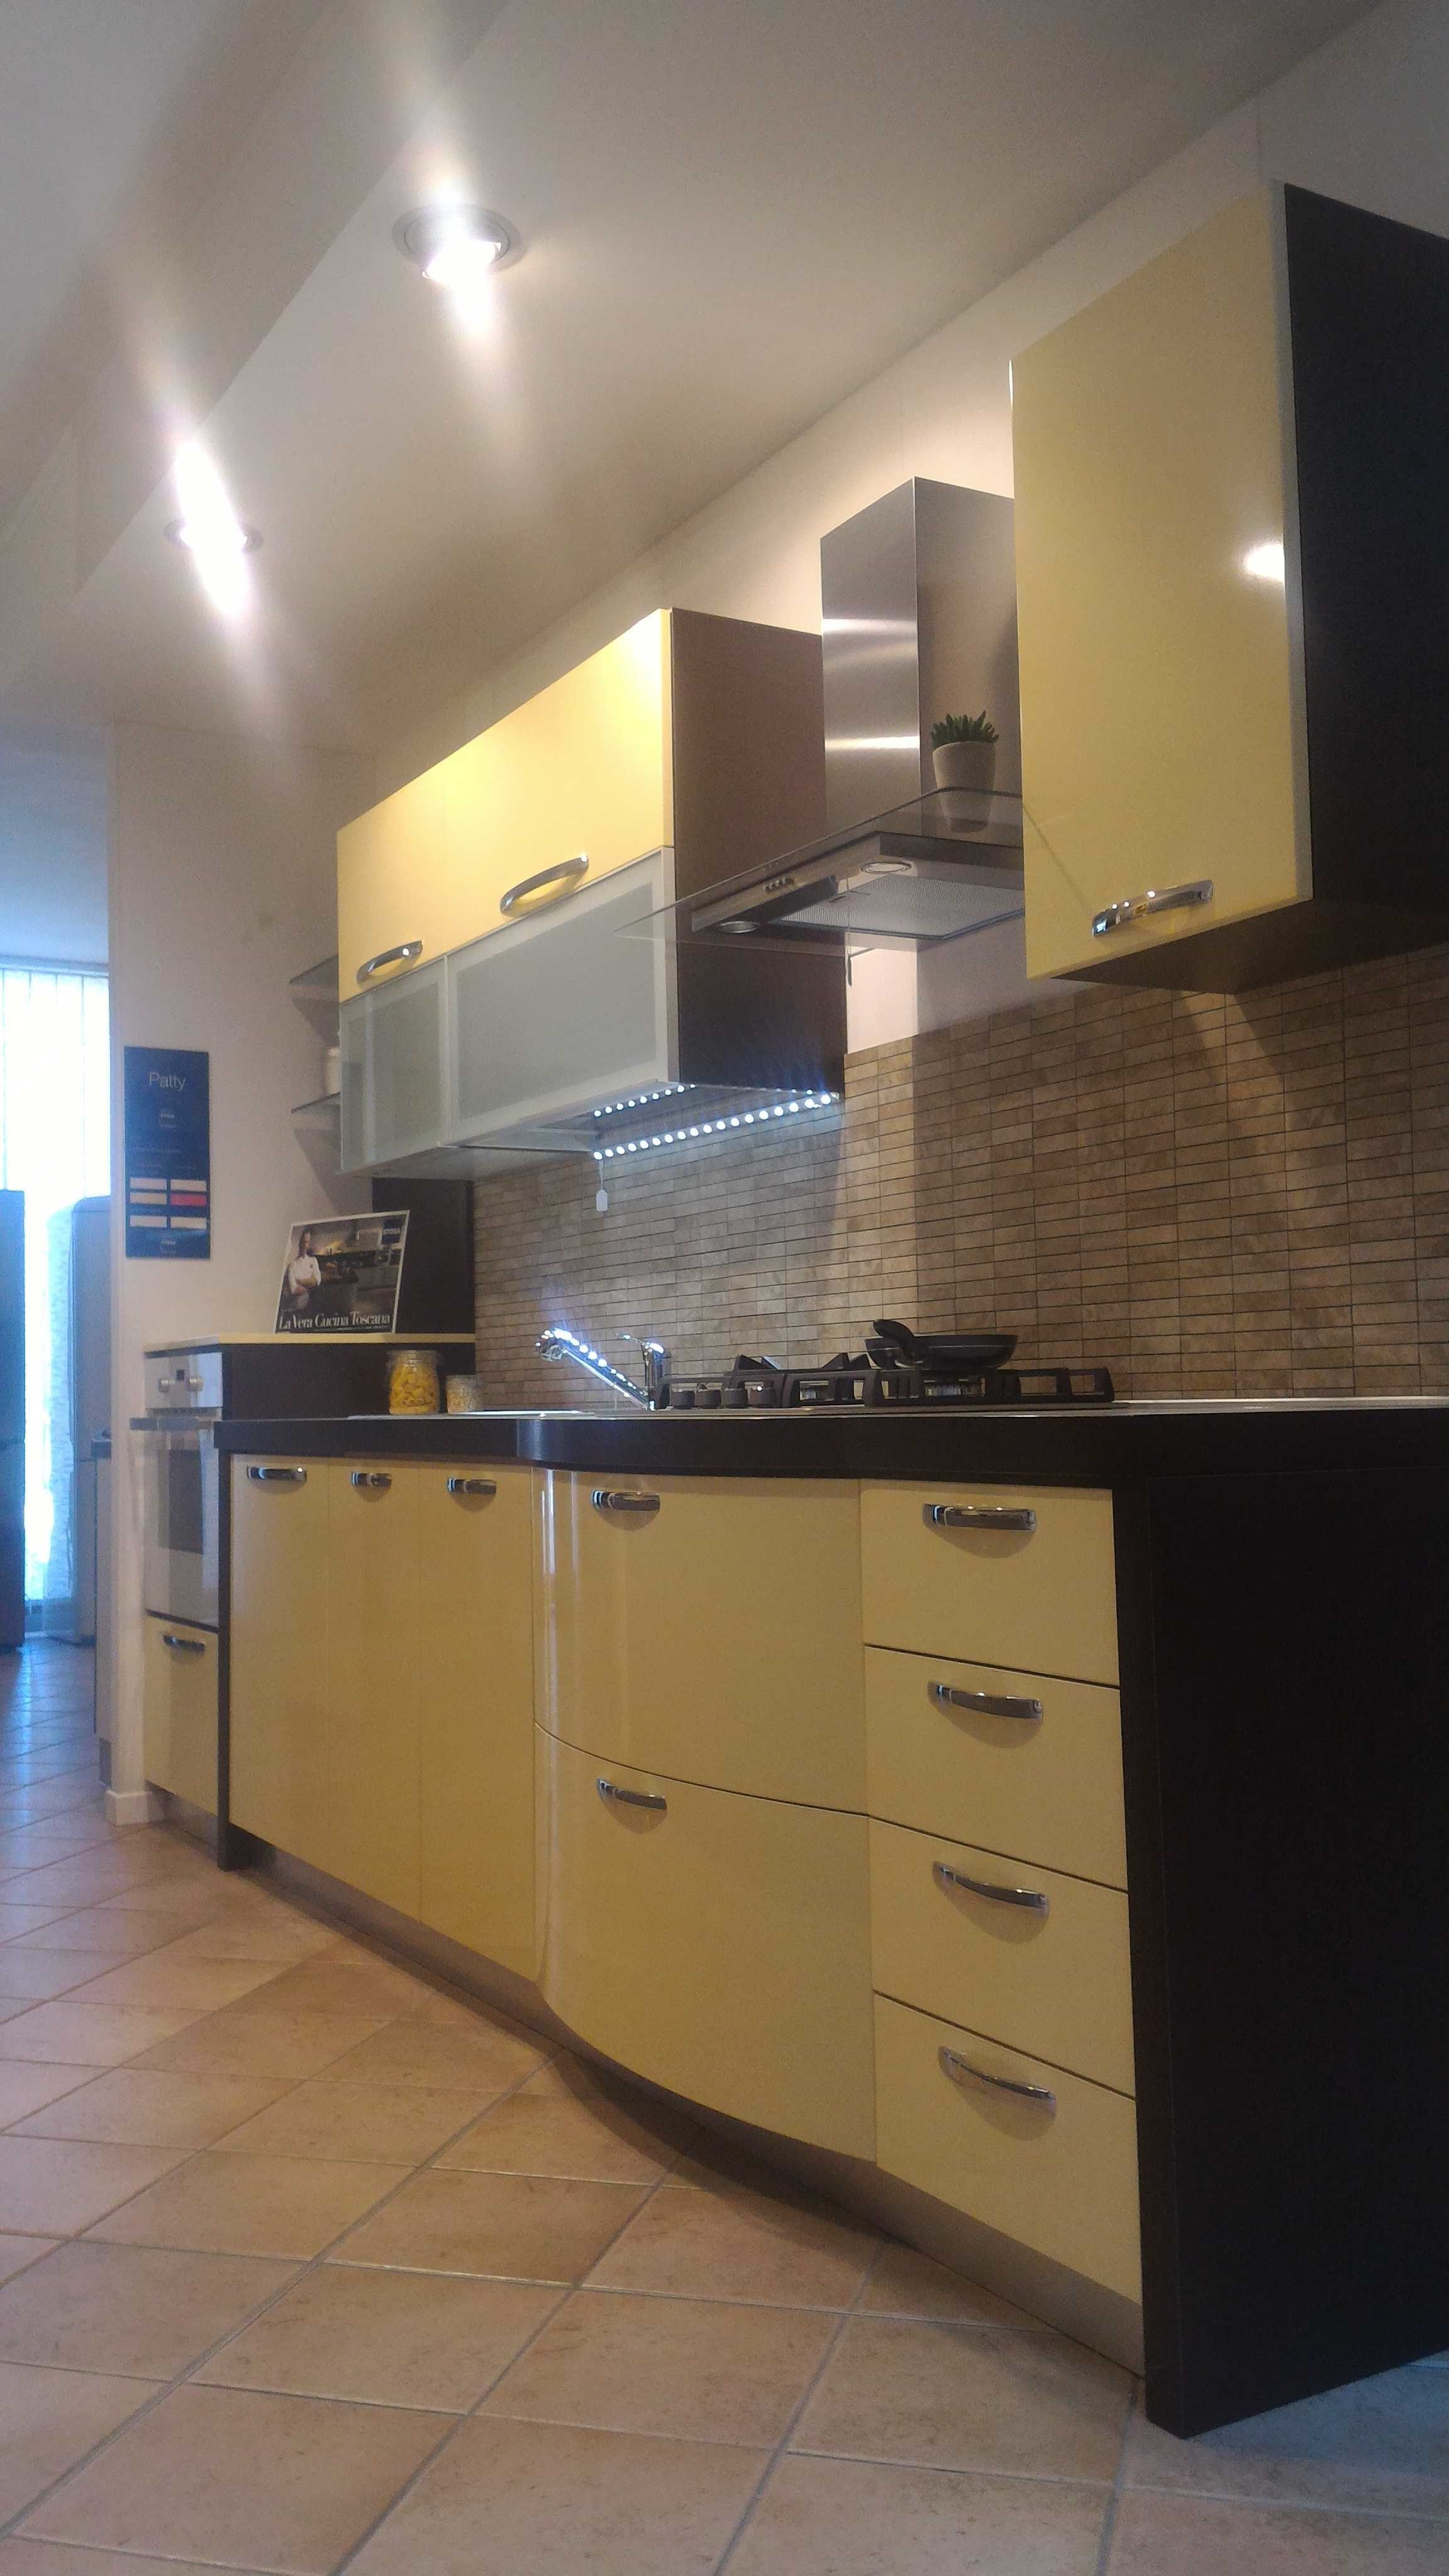 cucina patty stosa - 28 images - cucina lineare di stosa cucine ...